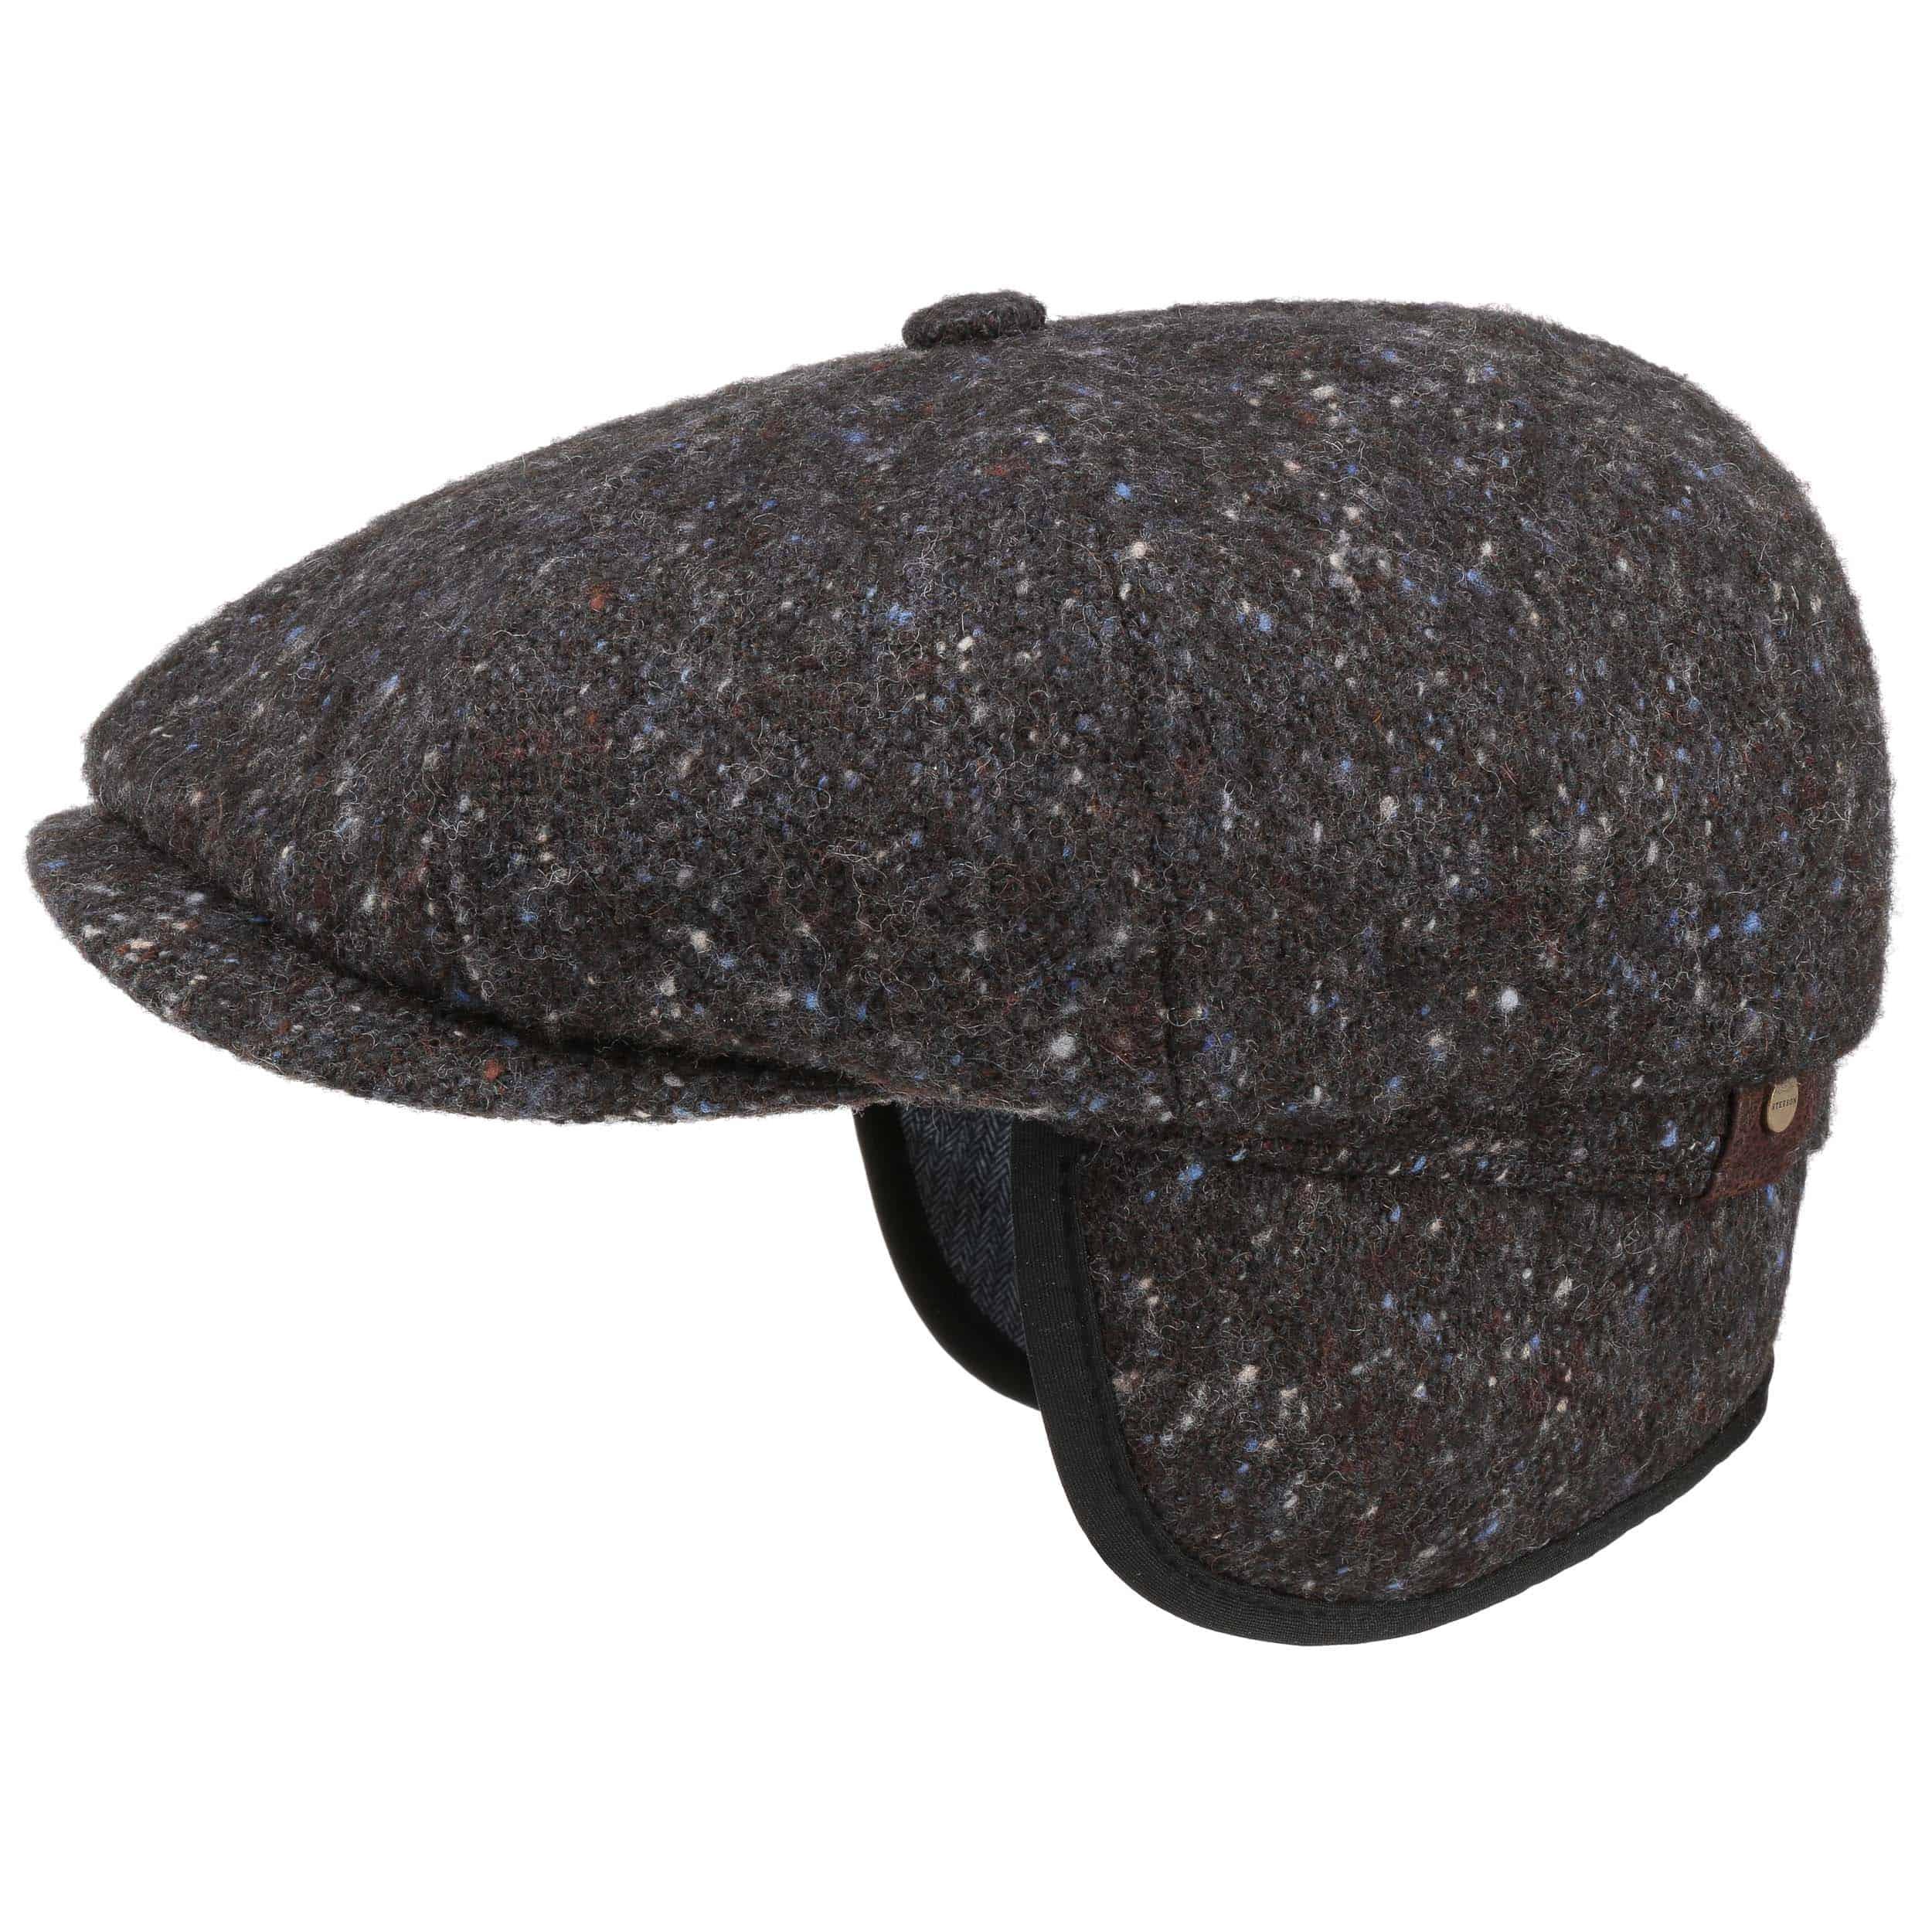 Hatteras Donegal Earflaps Cap By Stetson Eur 109 00 Hats Caps b108e47eab06